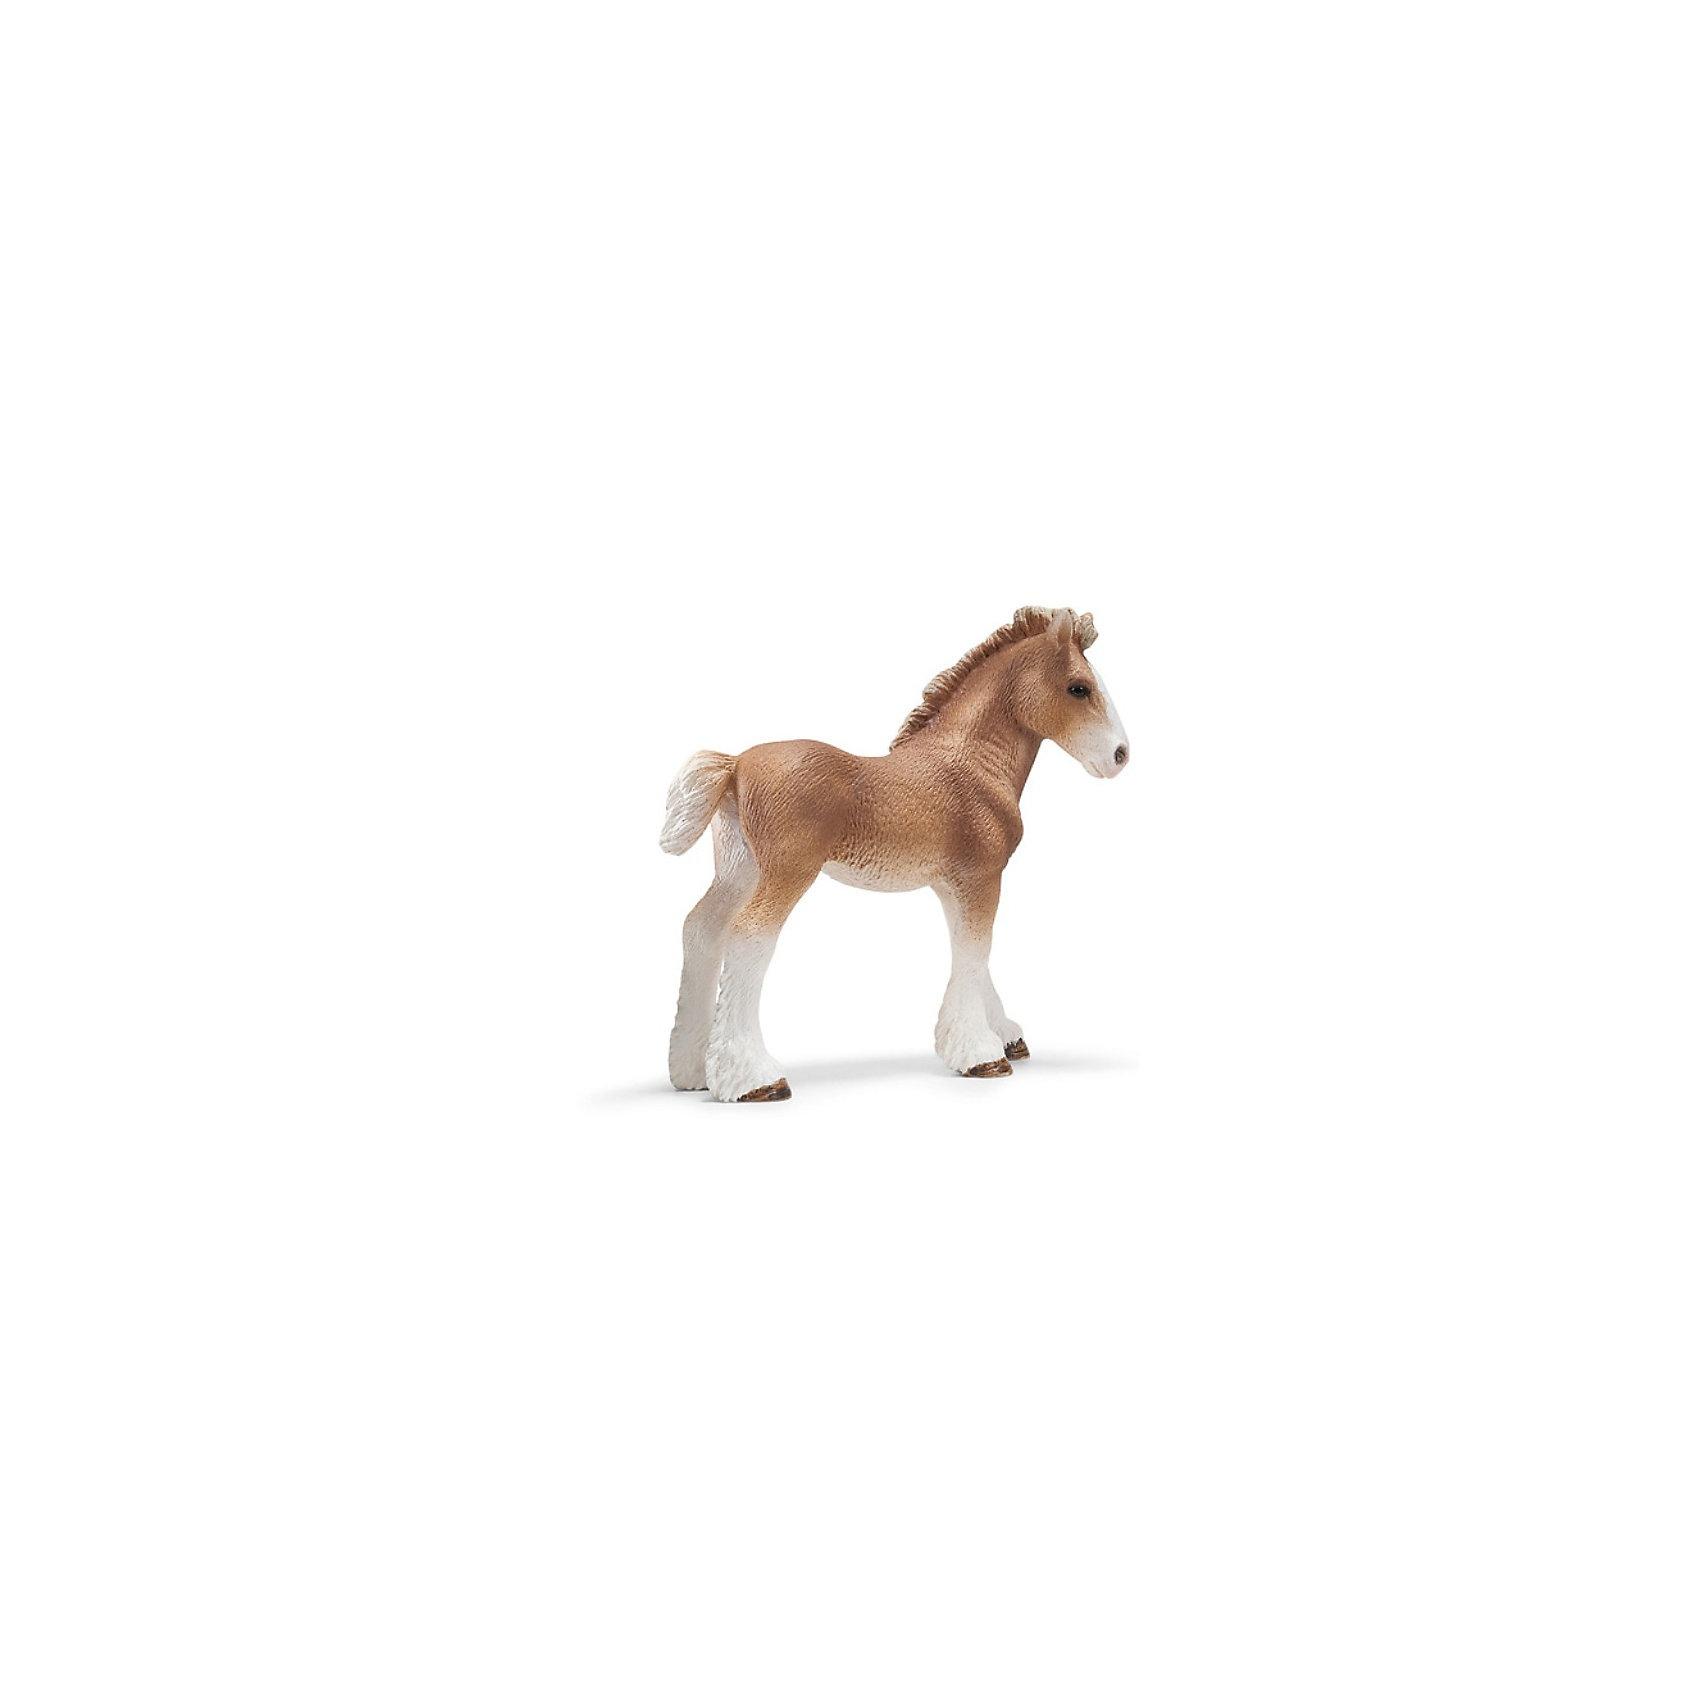 Schleich Schleich Жеребенок клейдесдальской породы. Серия Лошади фигурки игрушки schleich жеребенок клайдсдейл